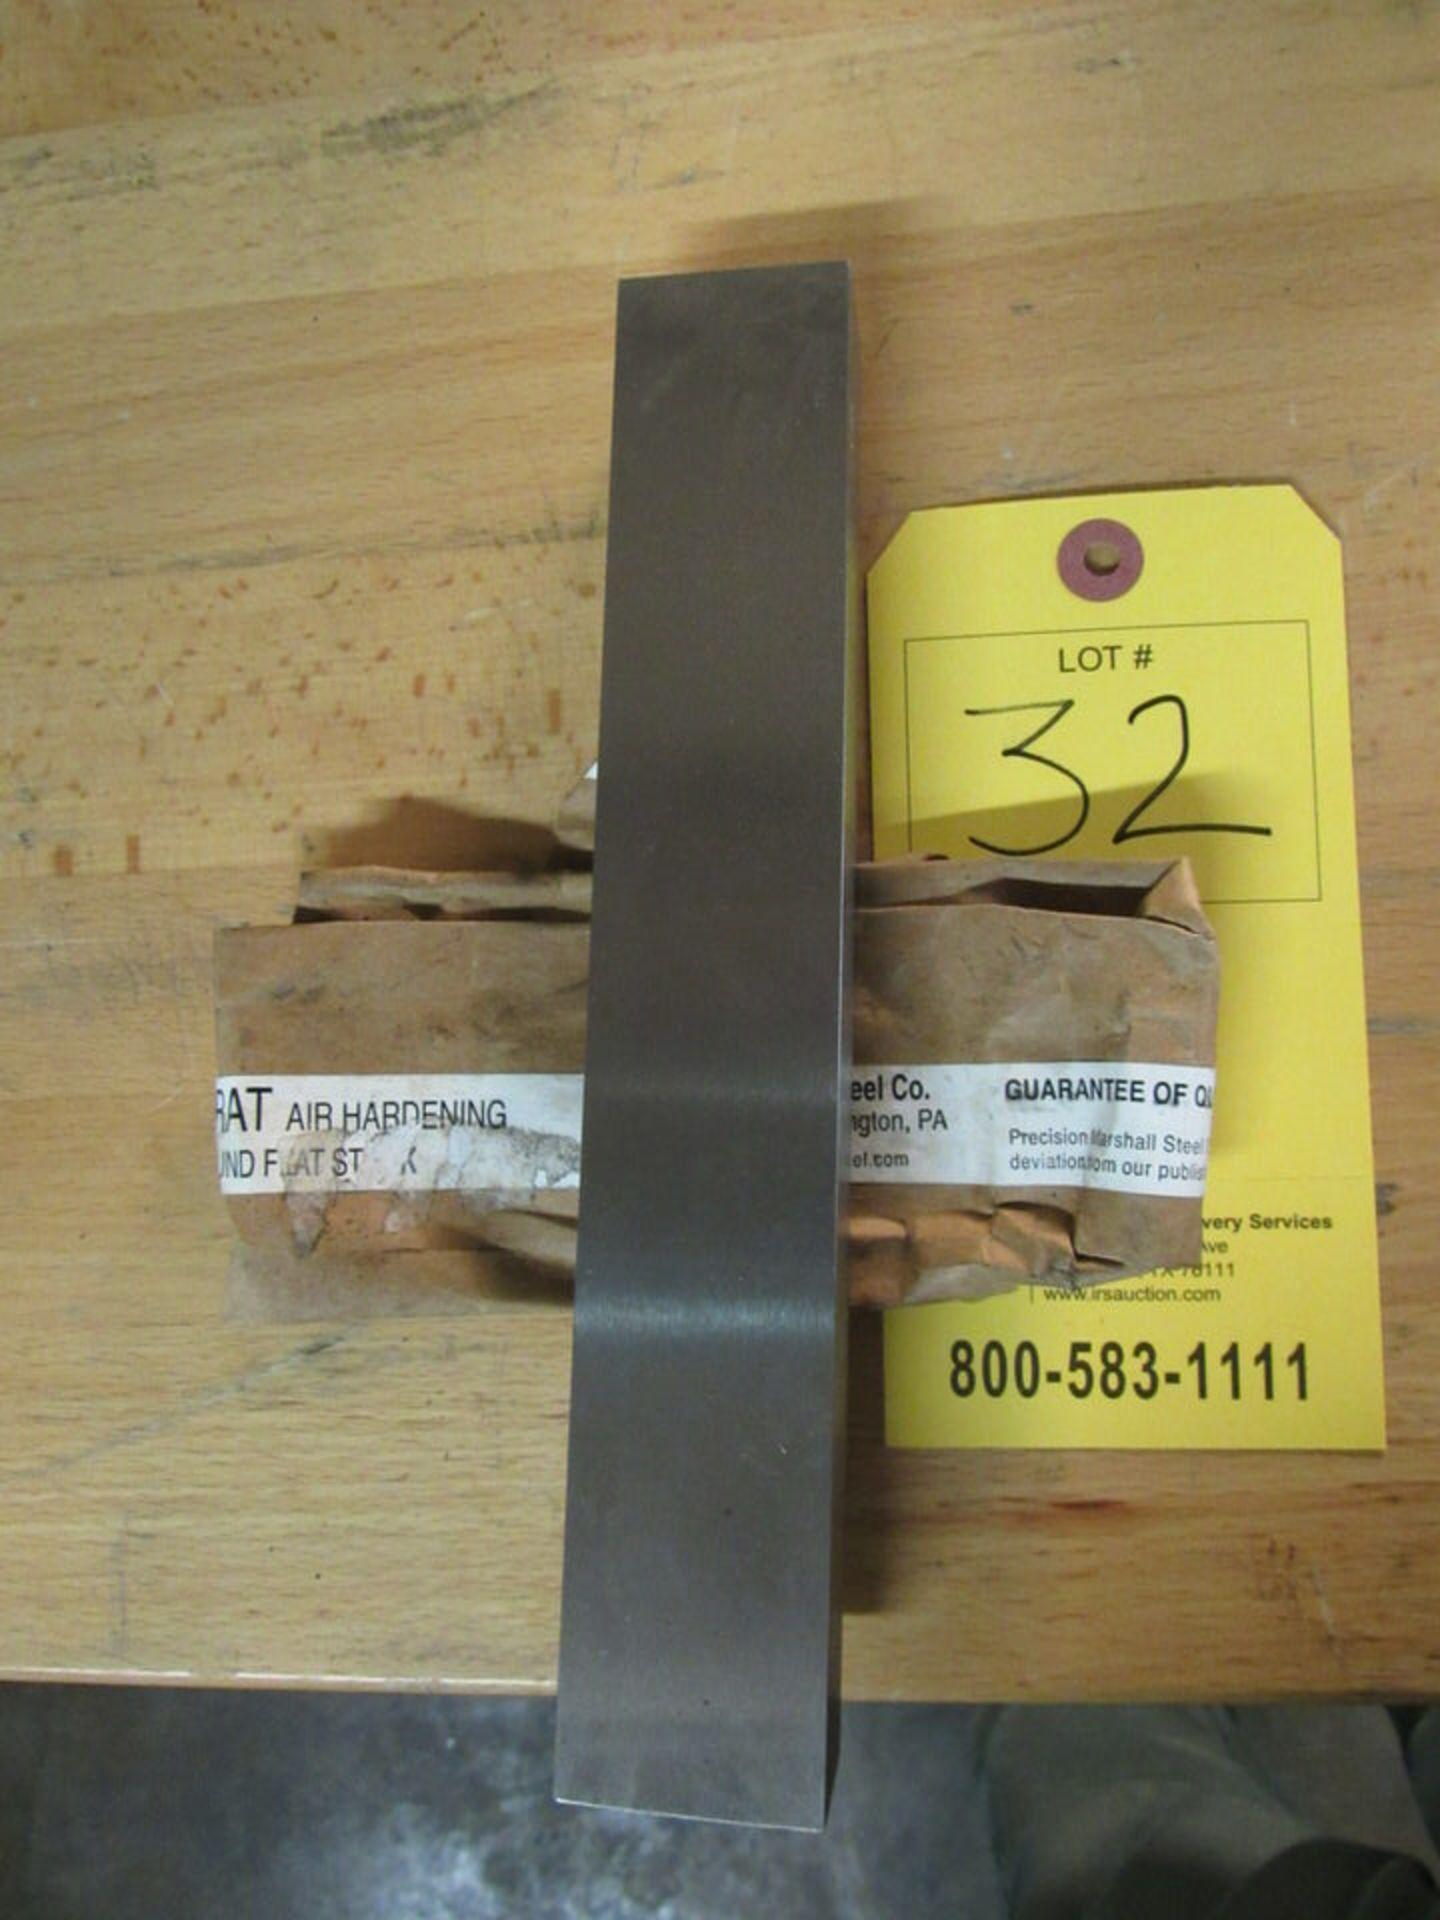 "Lot 32 - (1) 1"" x 1-1/2"" x 9"" long Precision Ground Flat Stock (Precision Marshall Steel Co.), Aristocrat Air"